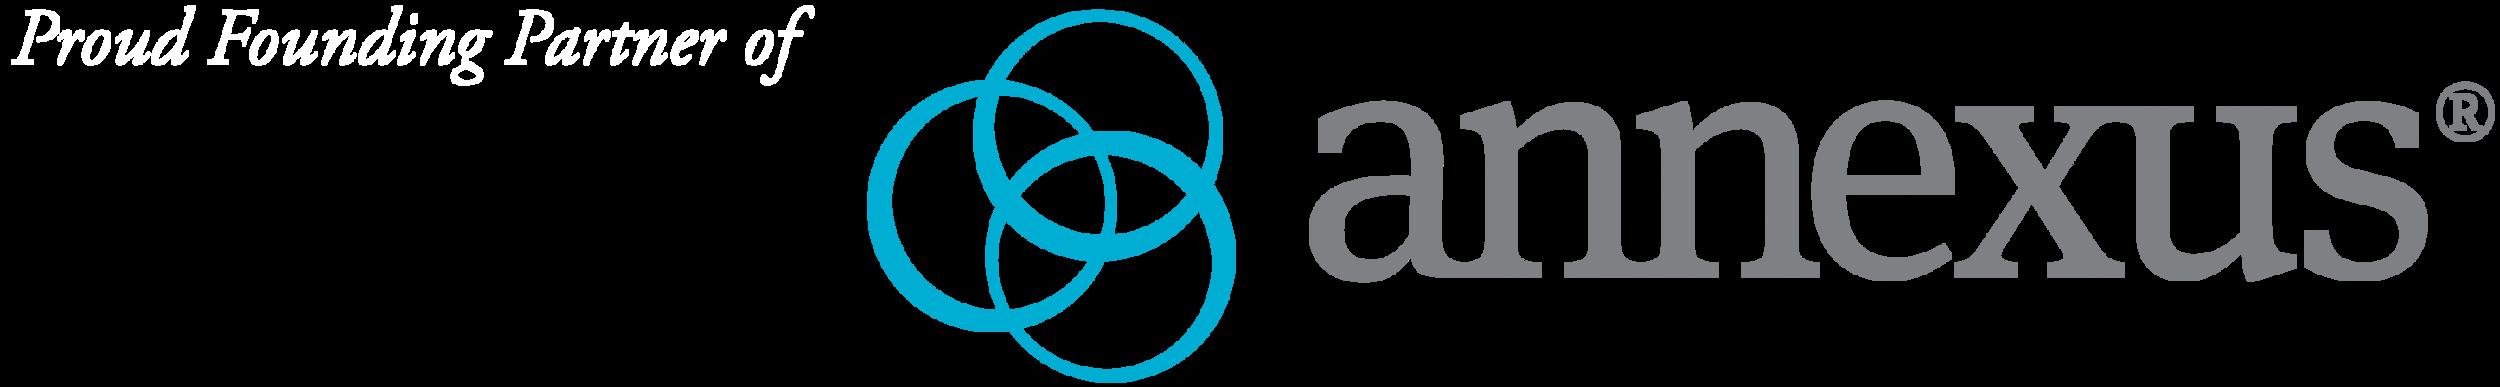 Annexus Partner